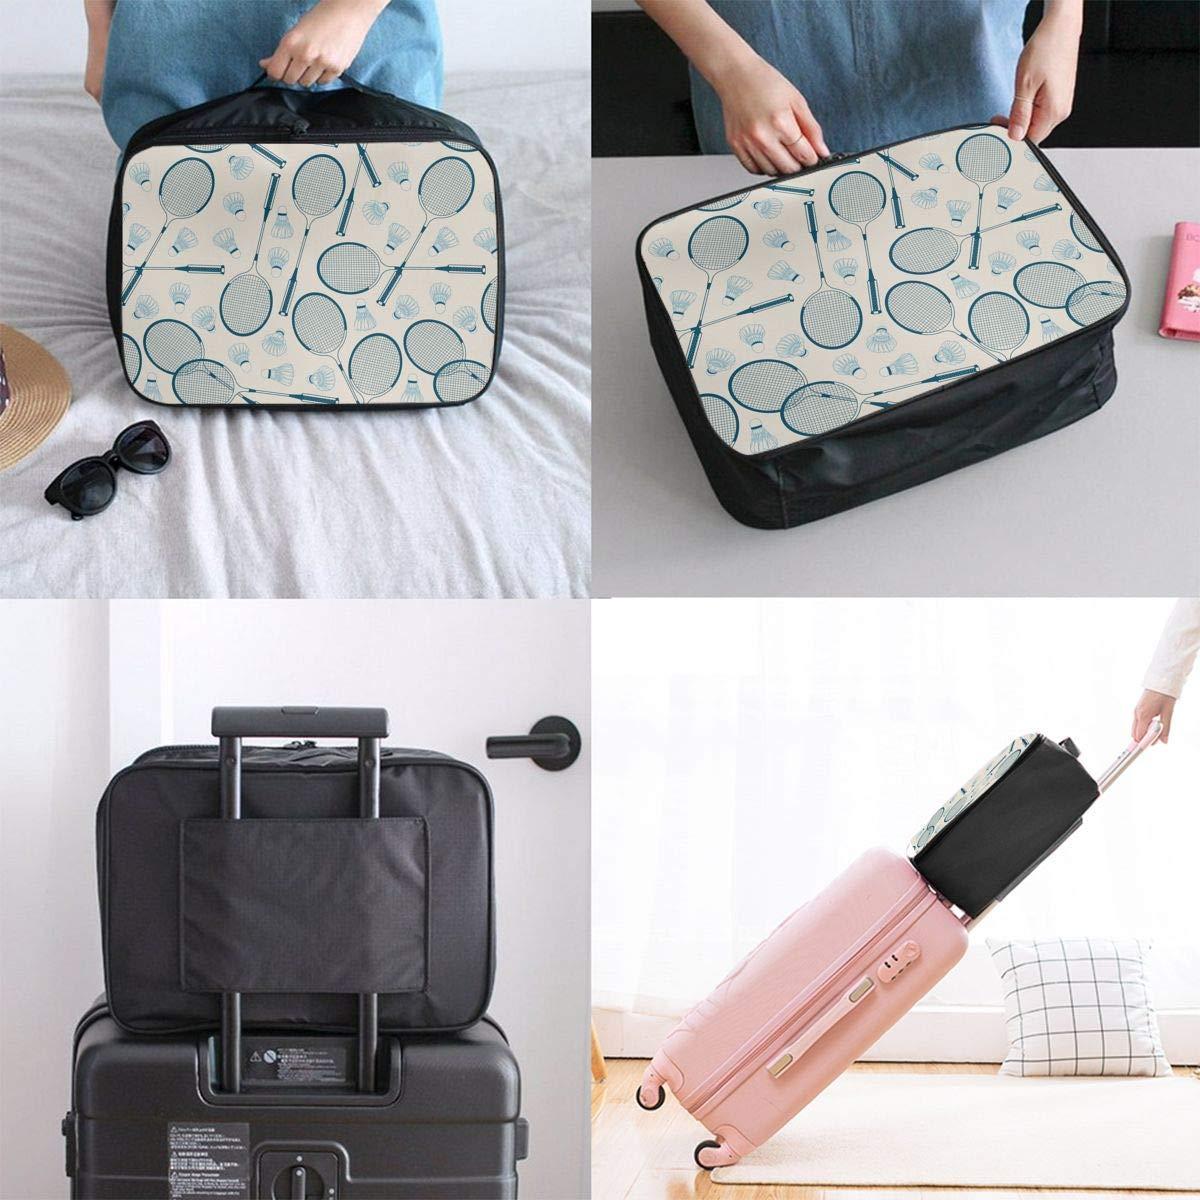 Badminton Set Pattern JTRVW Travel Luggage Trolley Bag Portable Lightweight Suitcases Duffle Tote Bag Handbag